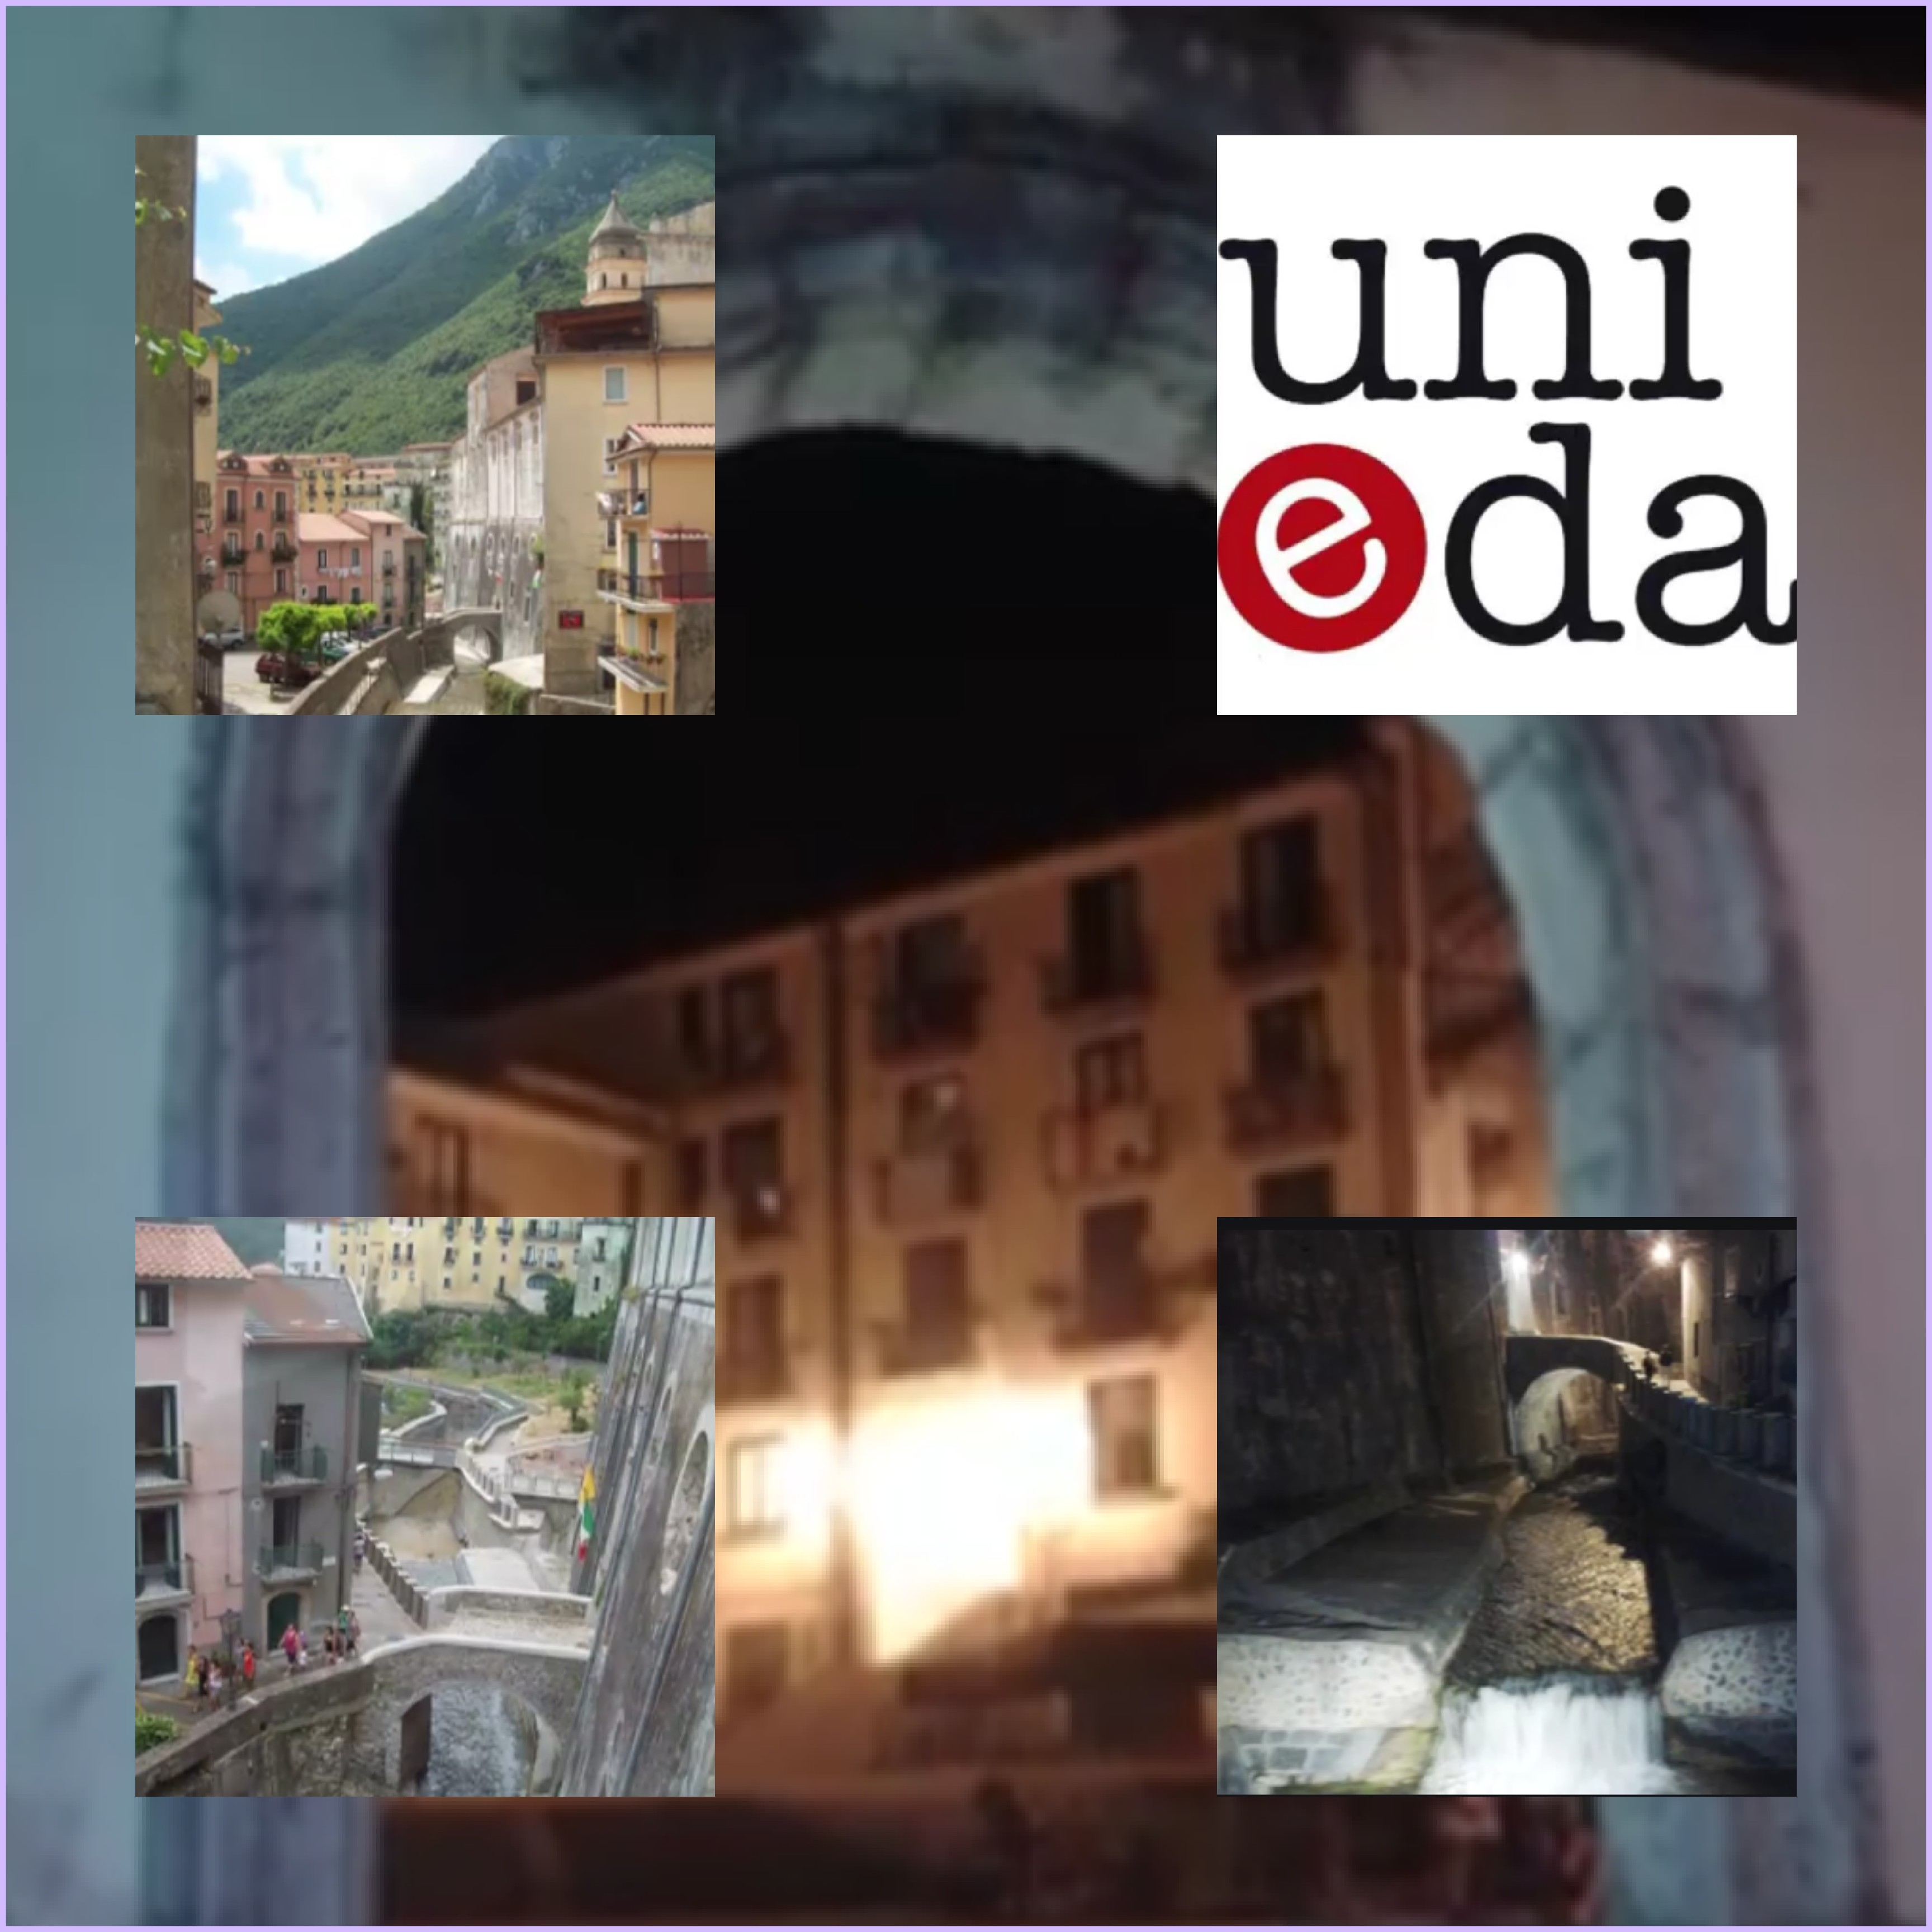 Campagna-Universita-di-strada-UPI